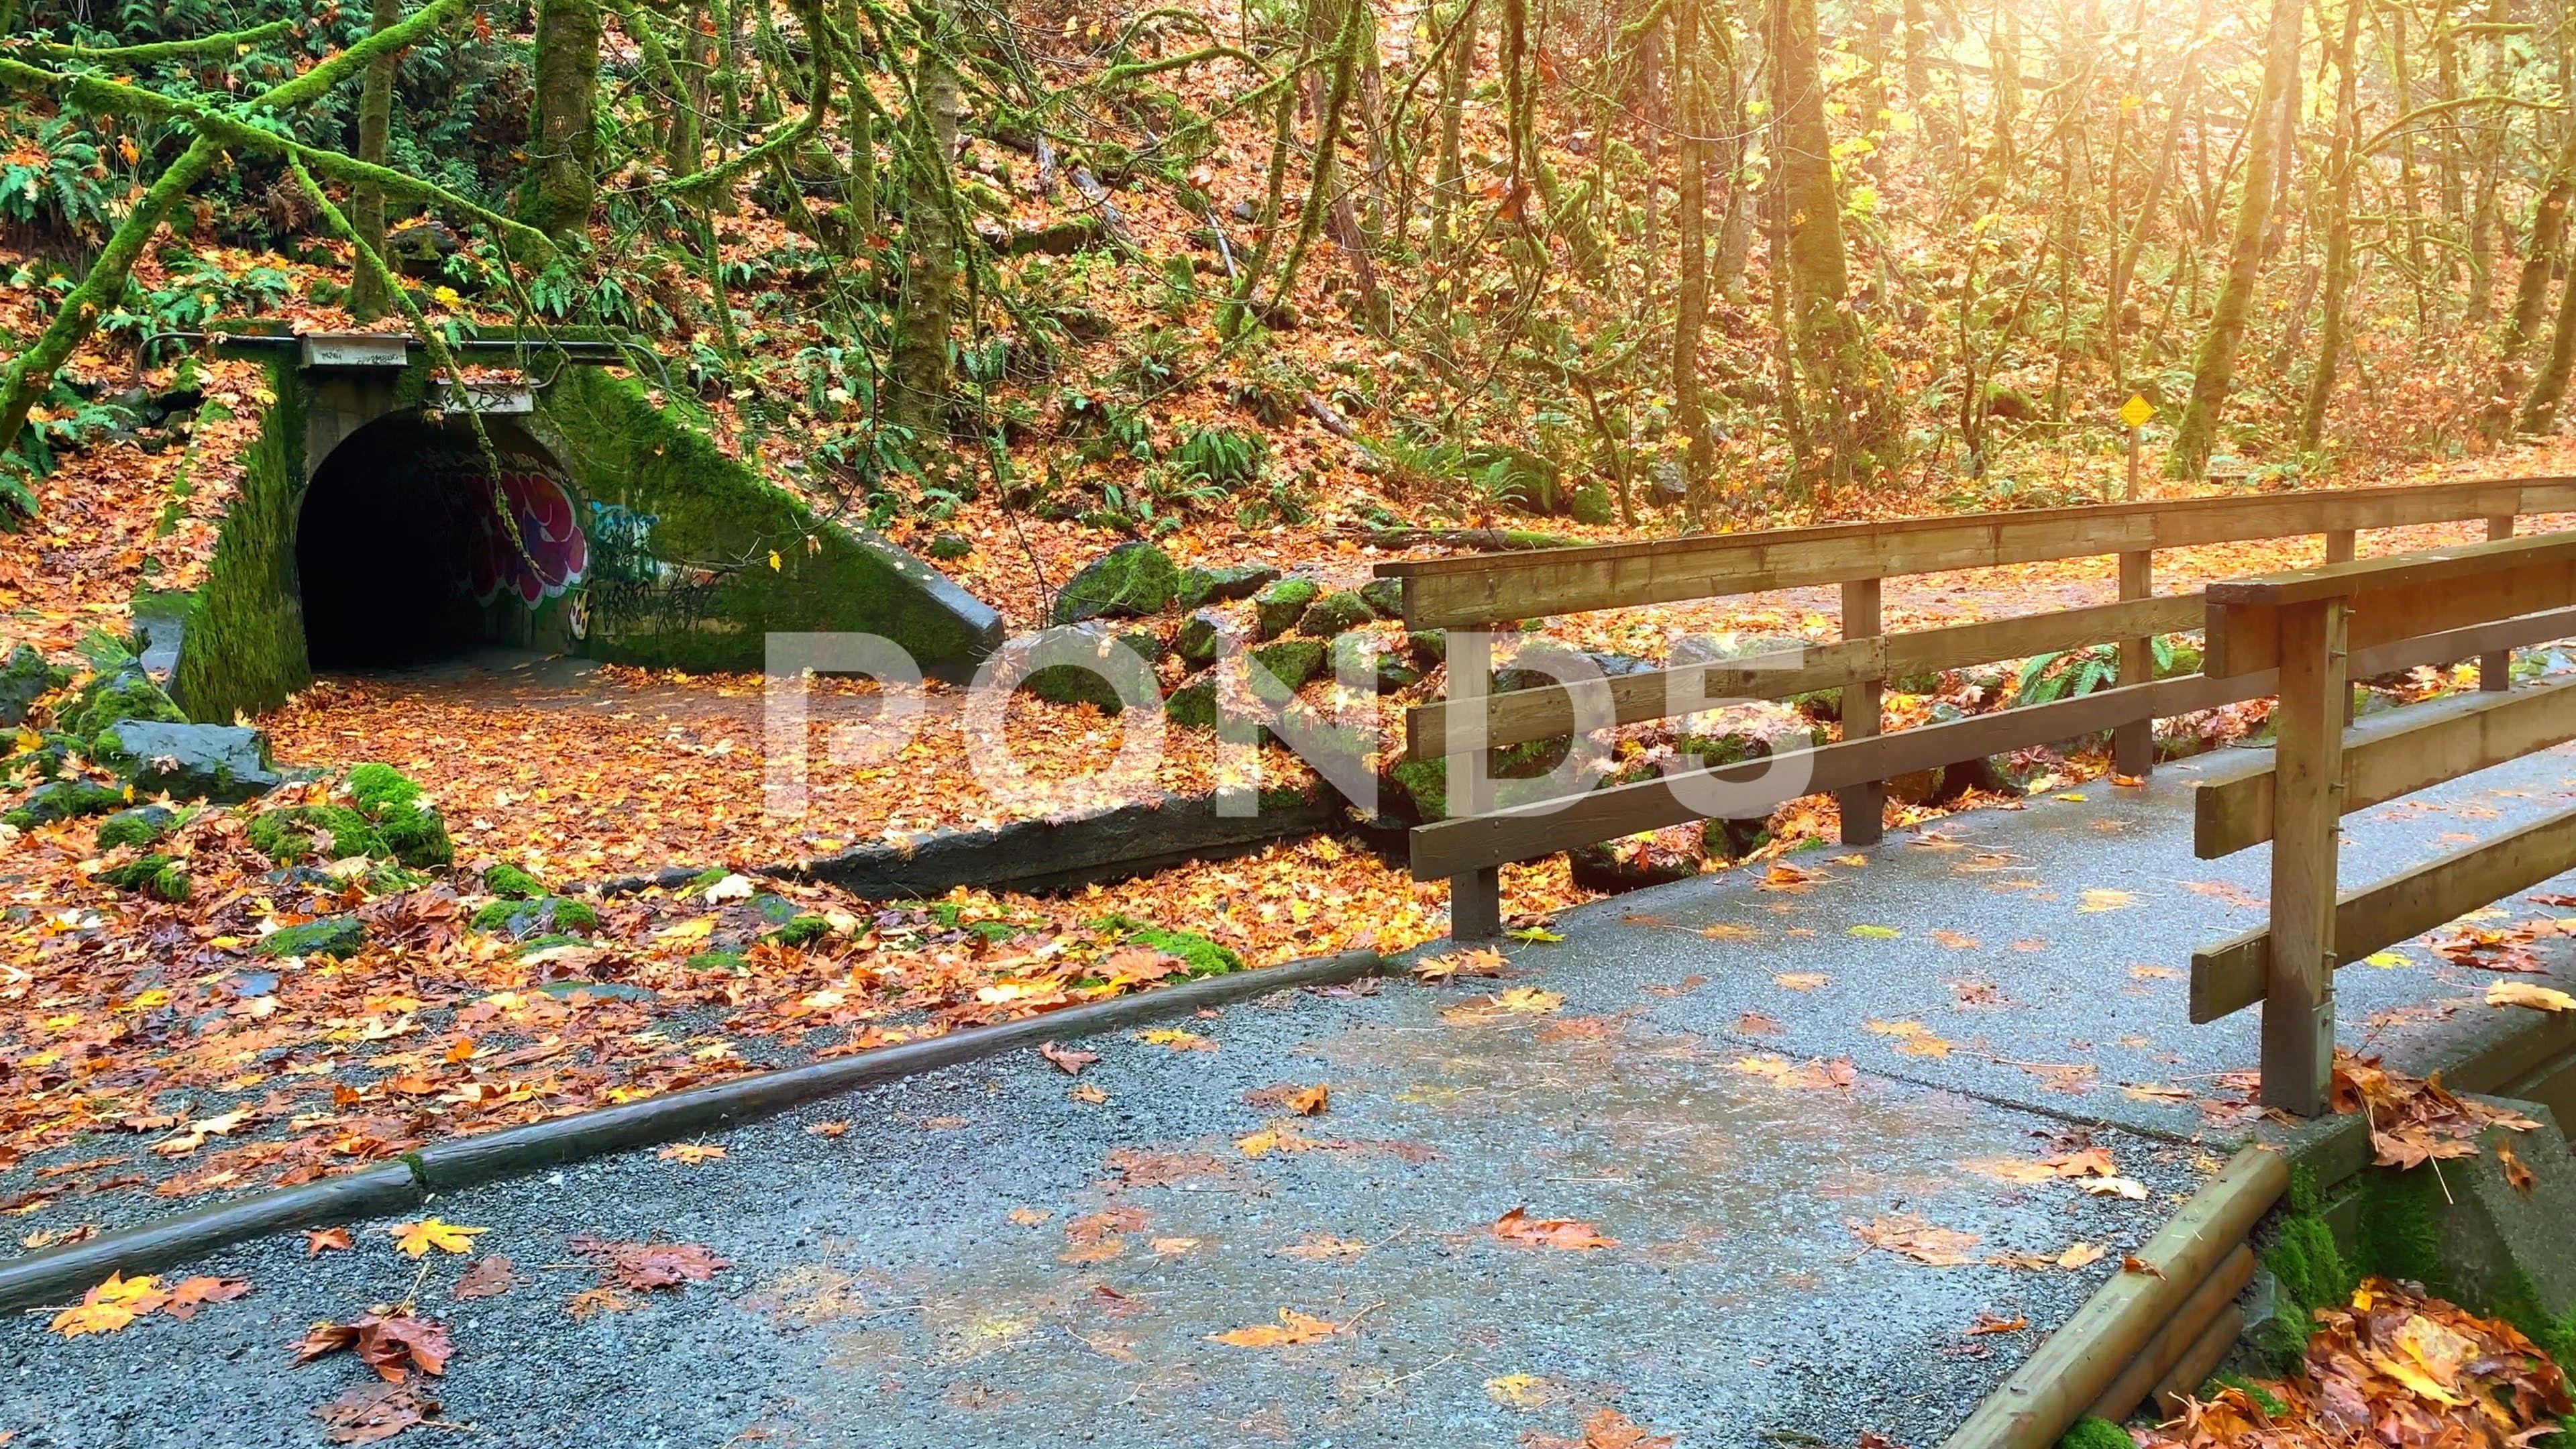 Beautiful Fall Autumn Nature Bridge Landscape Park Yellow Red Maple Leaf Bridge Stock Footage Ad Nature Bridge Lands With Images Autumn Nature Beautiful Fall Landscape